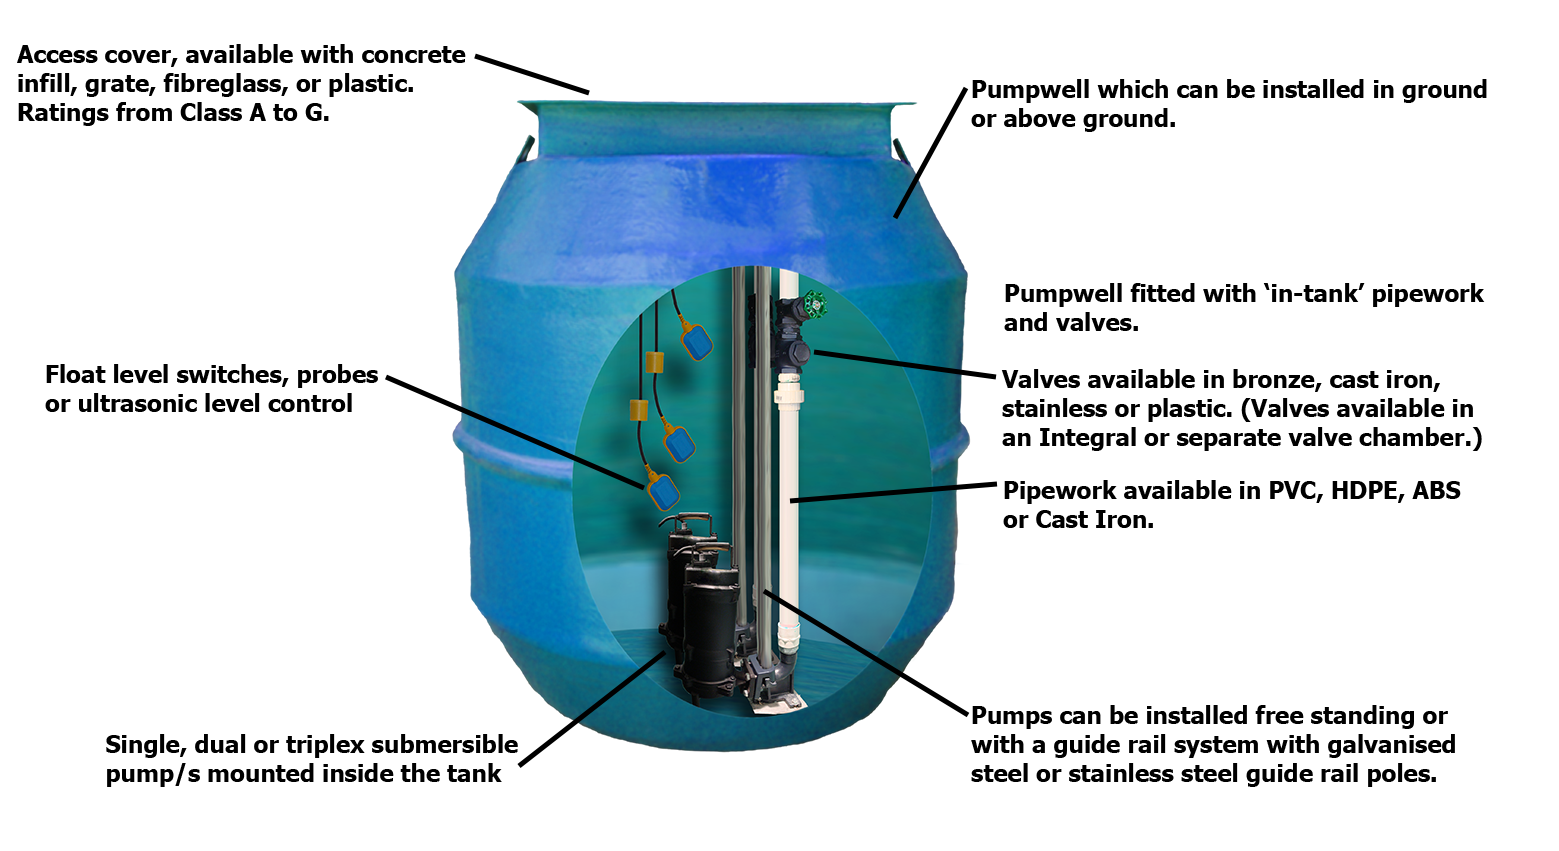 Sewer Pump Station Diagram York Thermostat Wiring Diagram